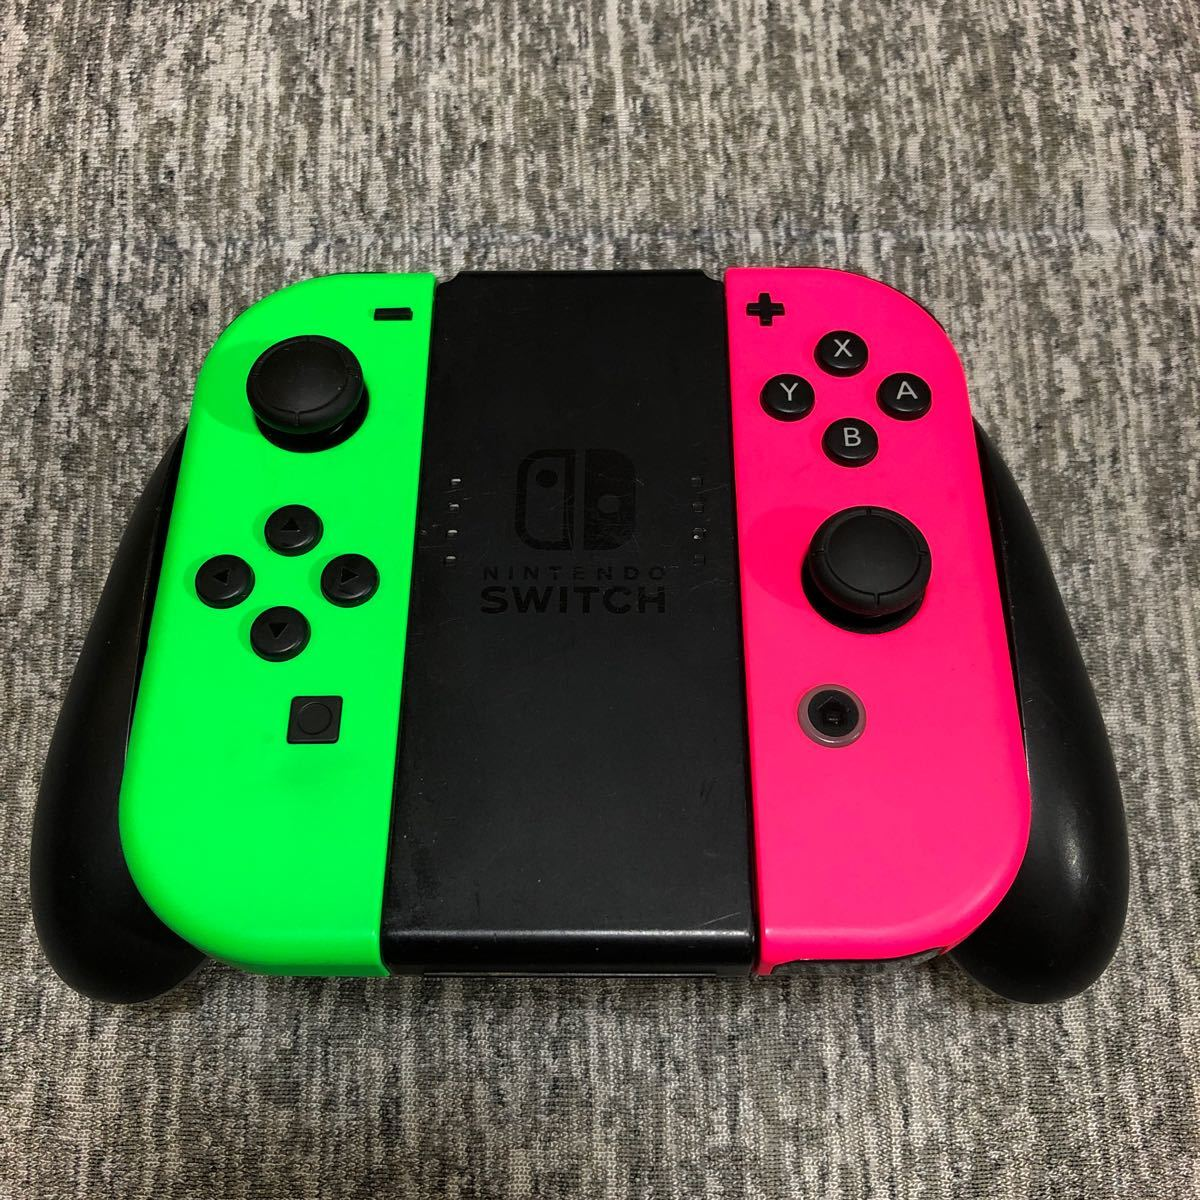 Nintendo Switch Joy-Con Joy-Conグリップ ネオングリーン ネオンピンク グリップおまけ付き